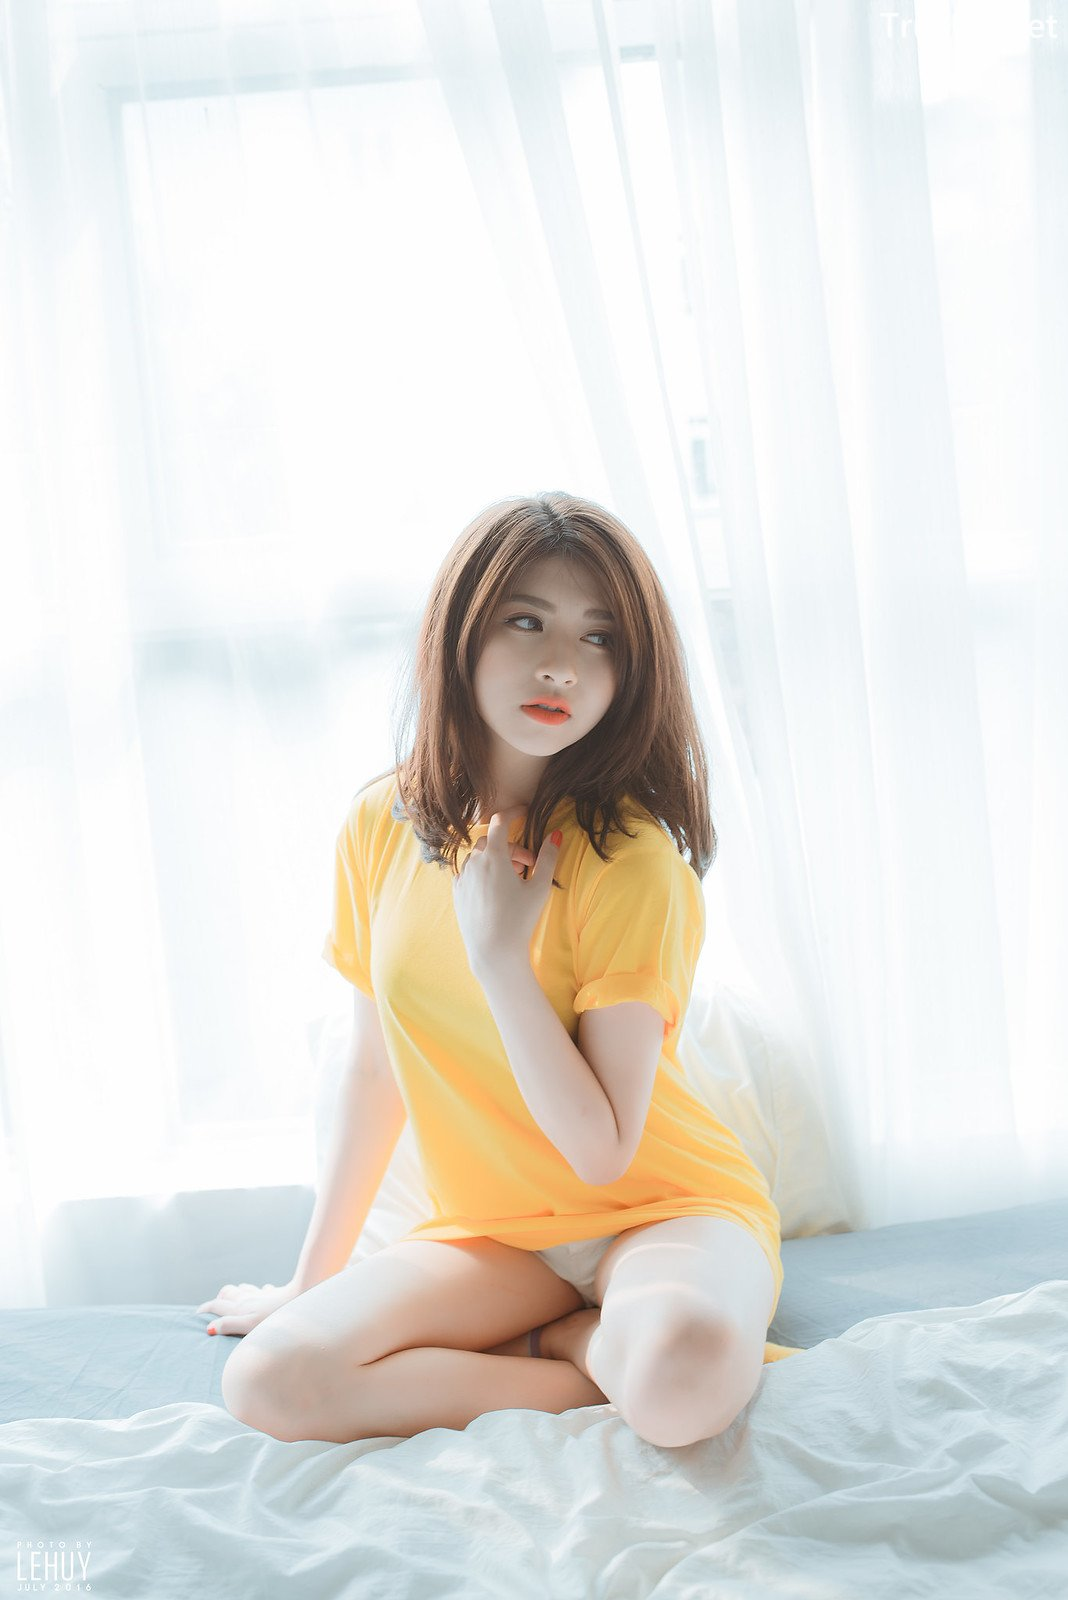 Image-Vietnamese-Hot-Girl-Photo-Cute-Little-Pikachu-Girl-TruePic.net- Picture-9